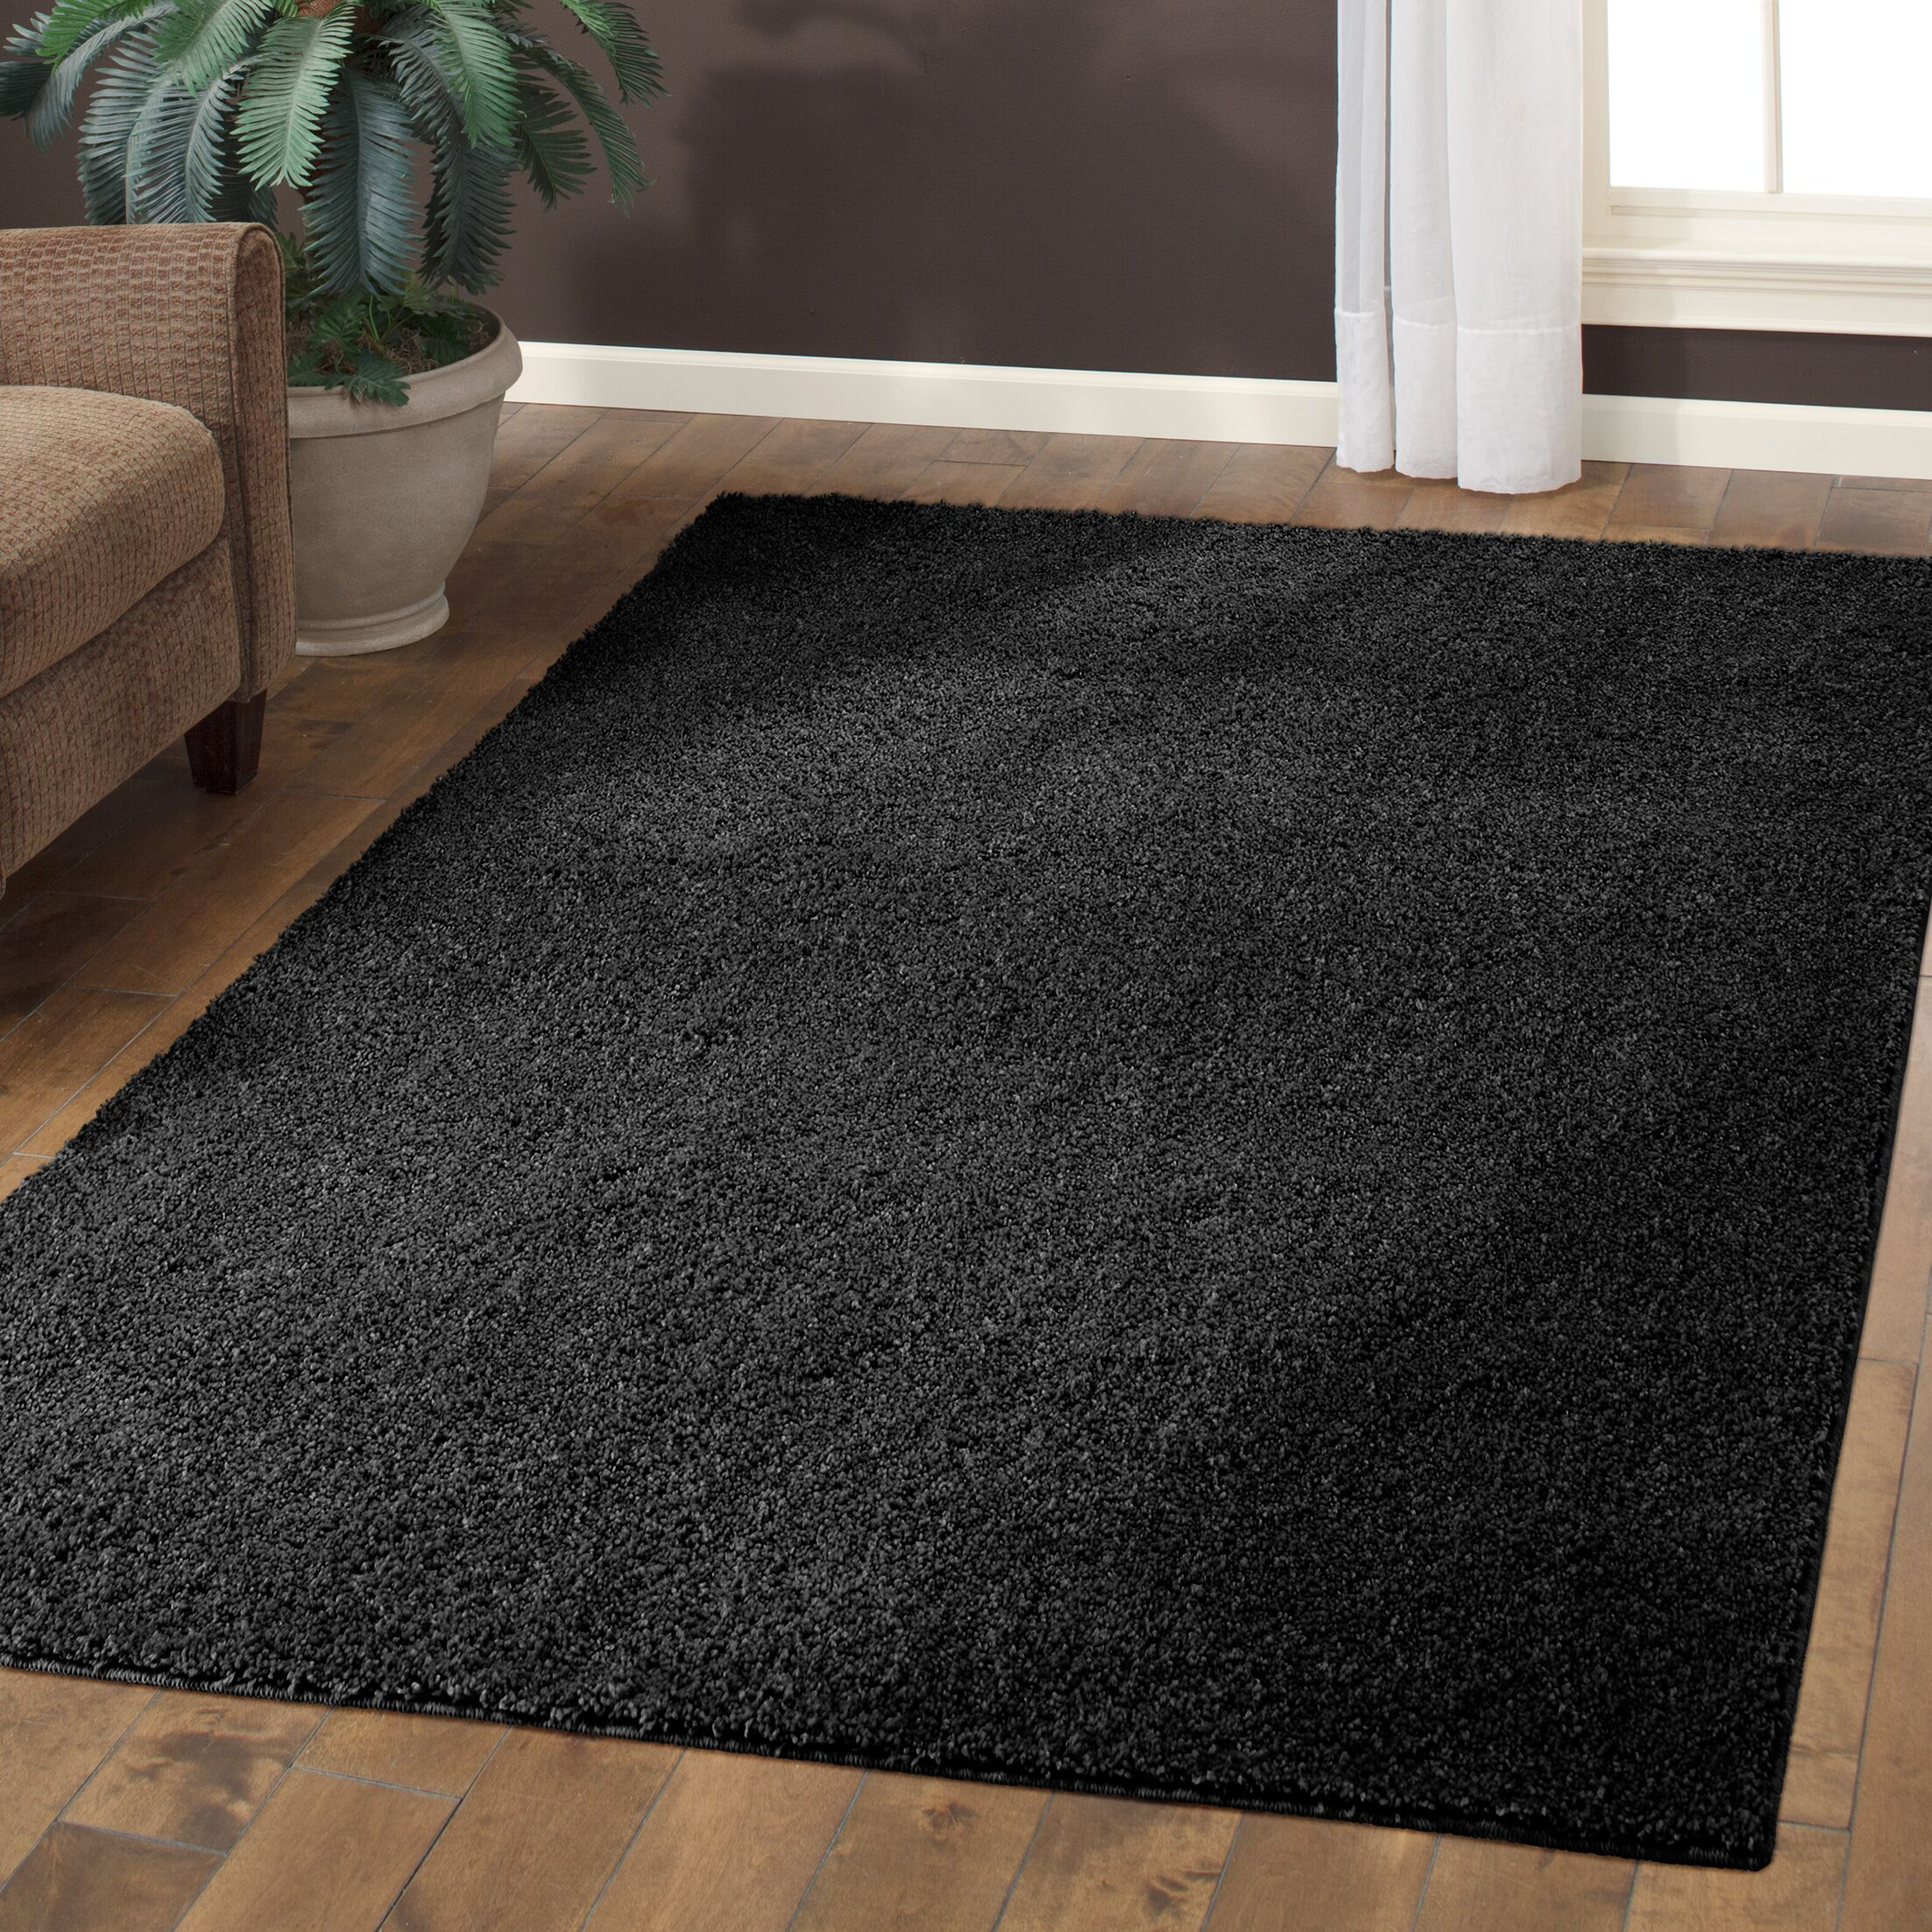 Aviles Black Area Rug Rug Size: 7' x 10'